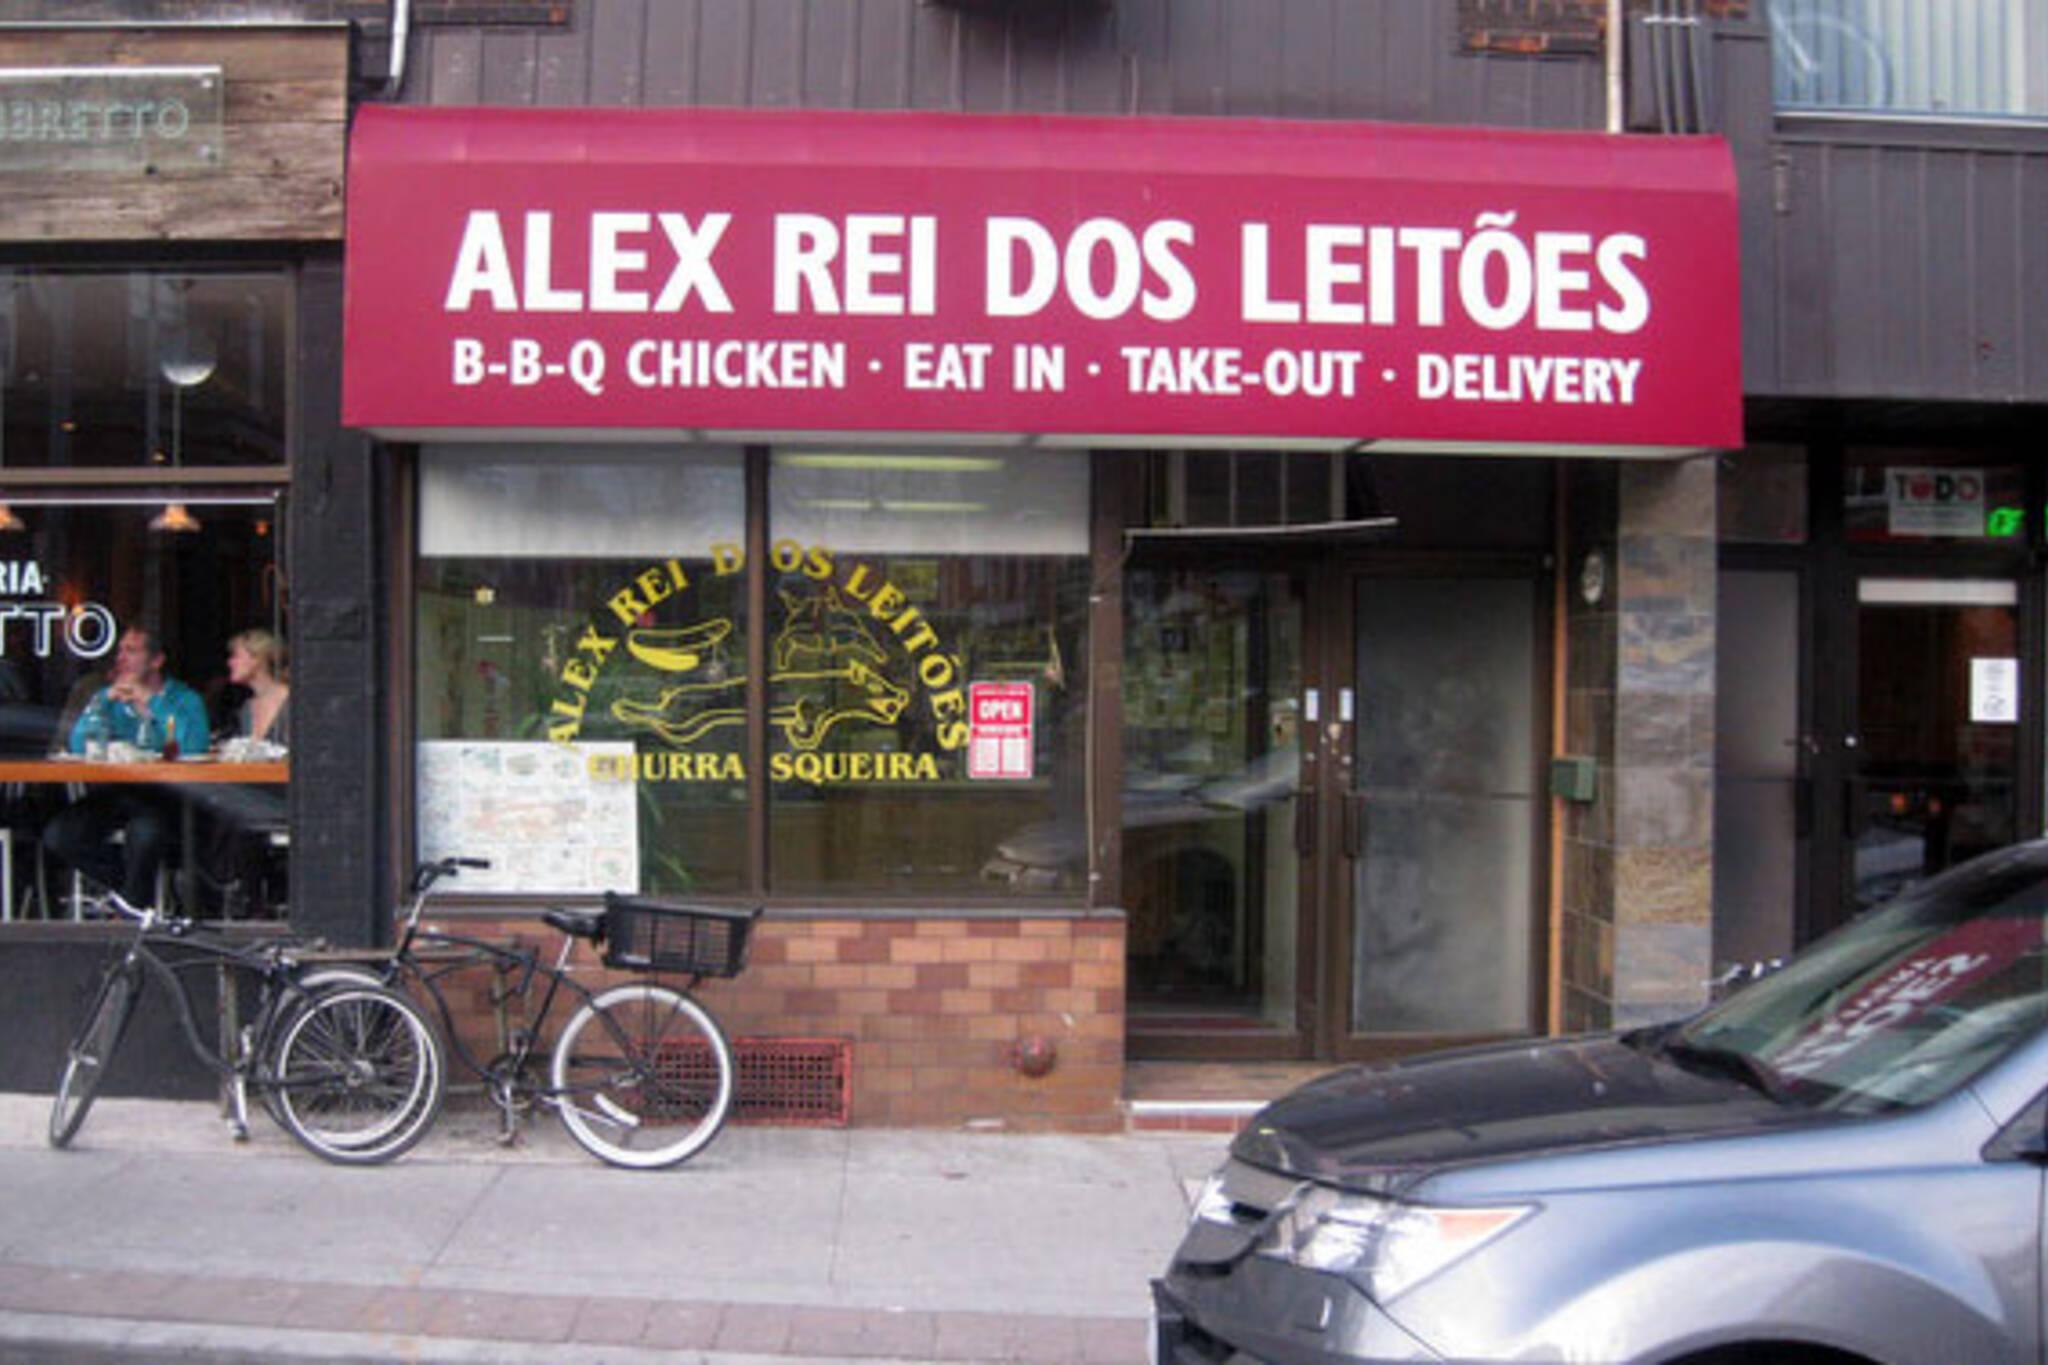 Alex Rei dos Leitoes